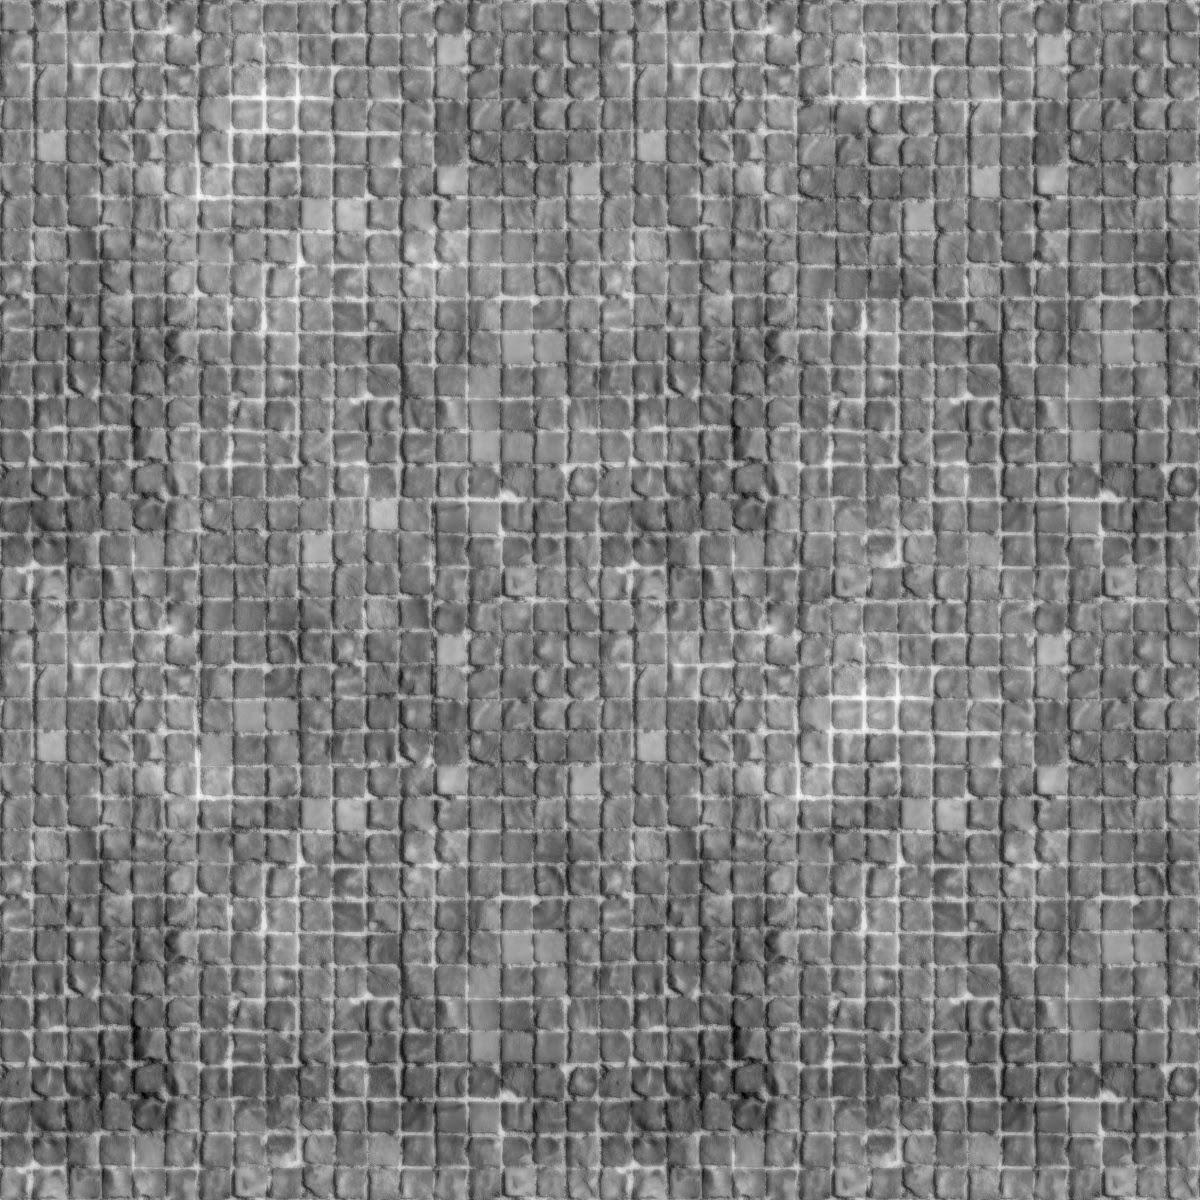 Seamless Brick Stone Pavement Texture + (Maps) | Texturise Free Seamless Textures With Maps